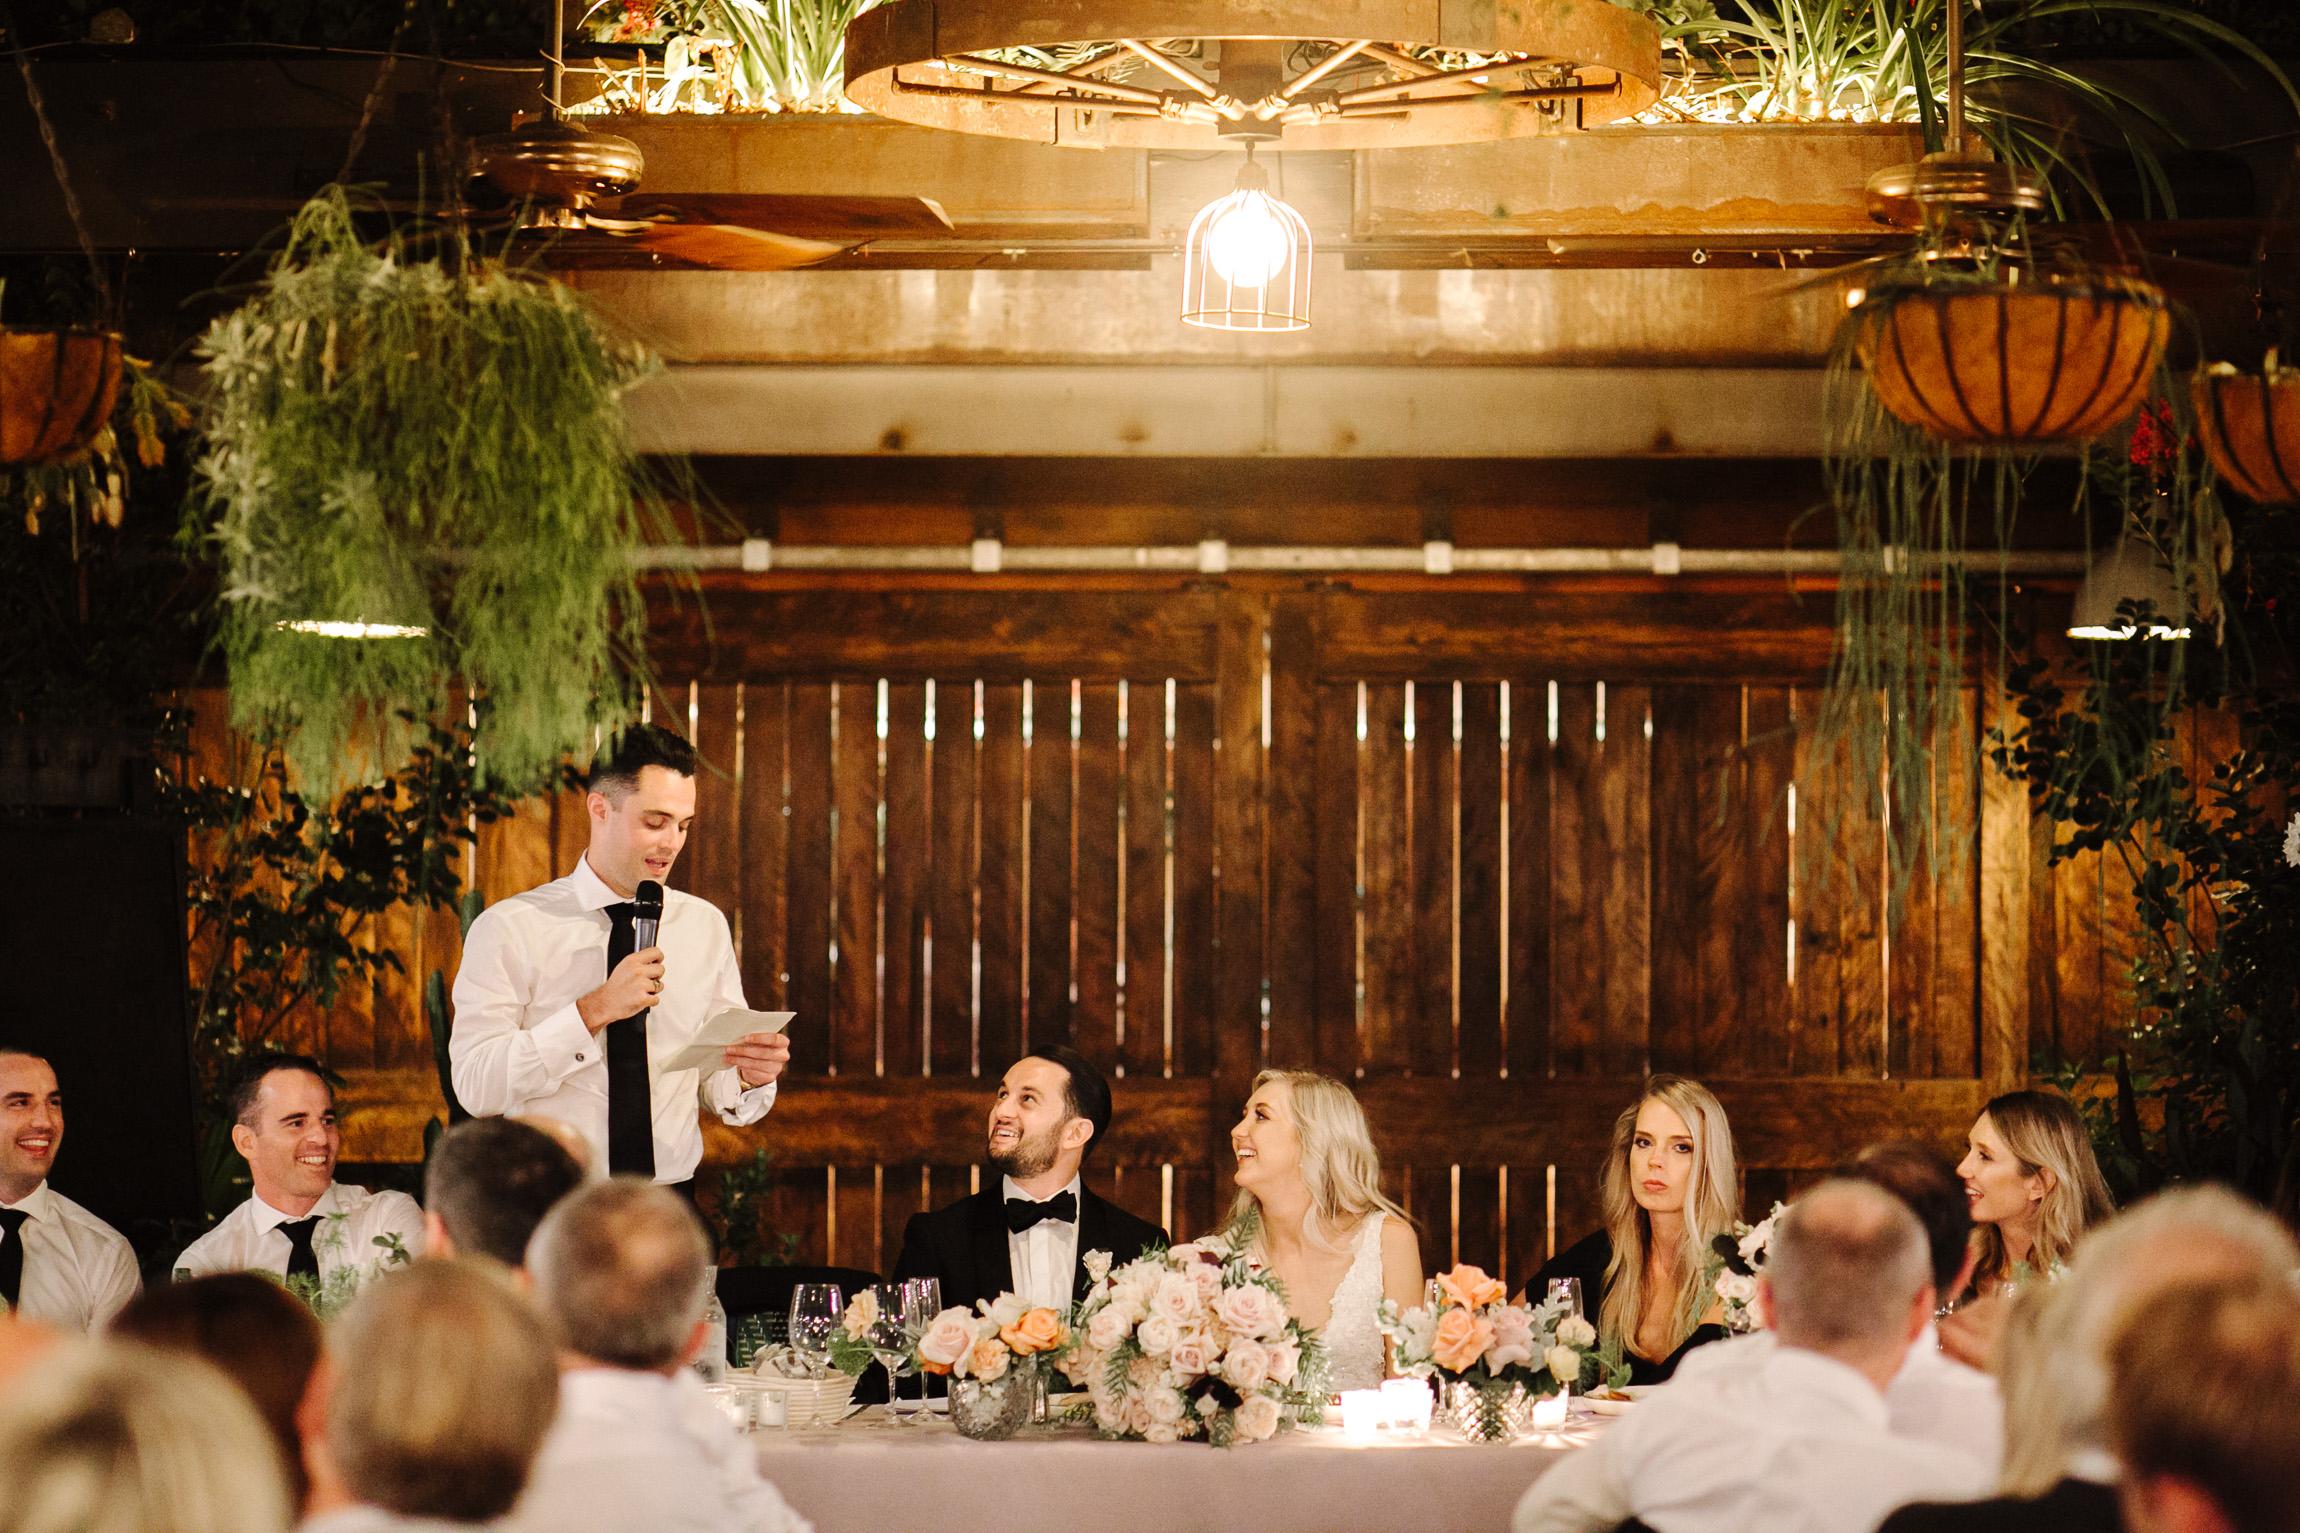 180223_justinaaron_wedding_charlotte_david_h-275.jpg